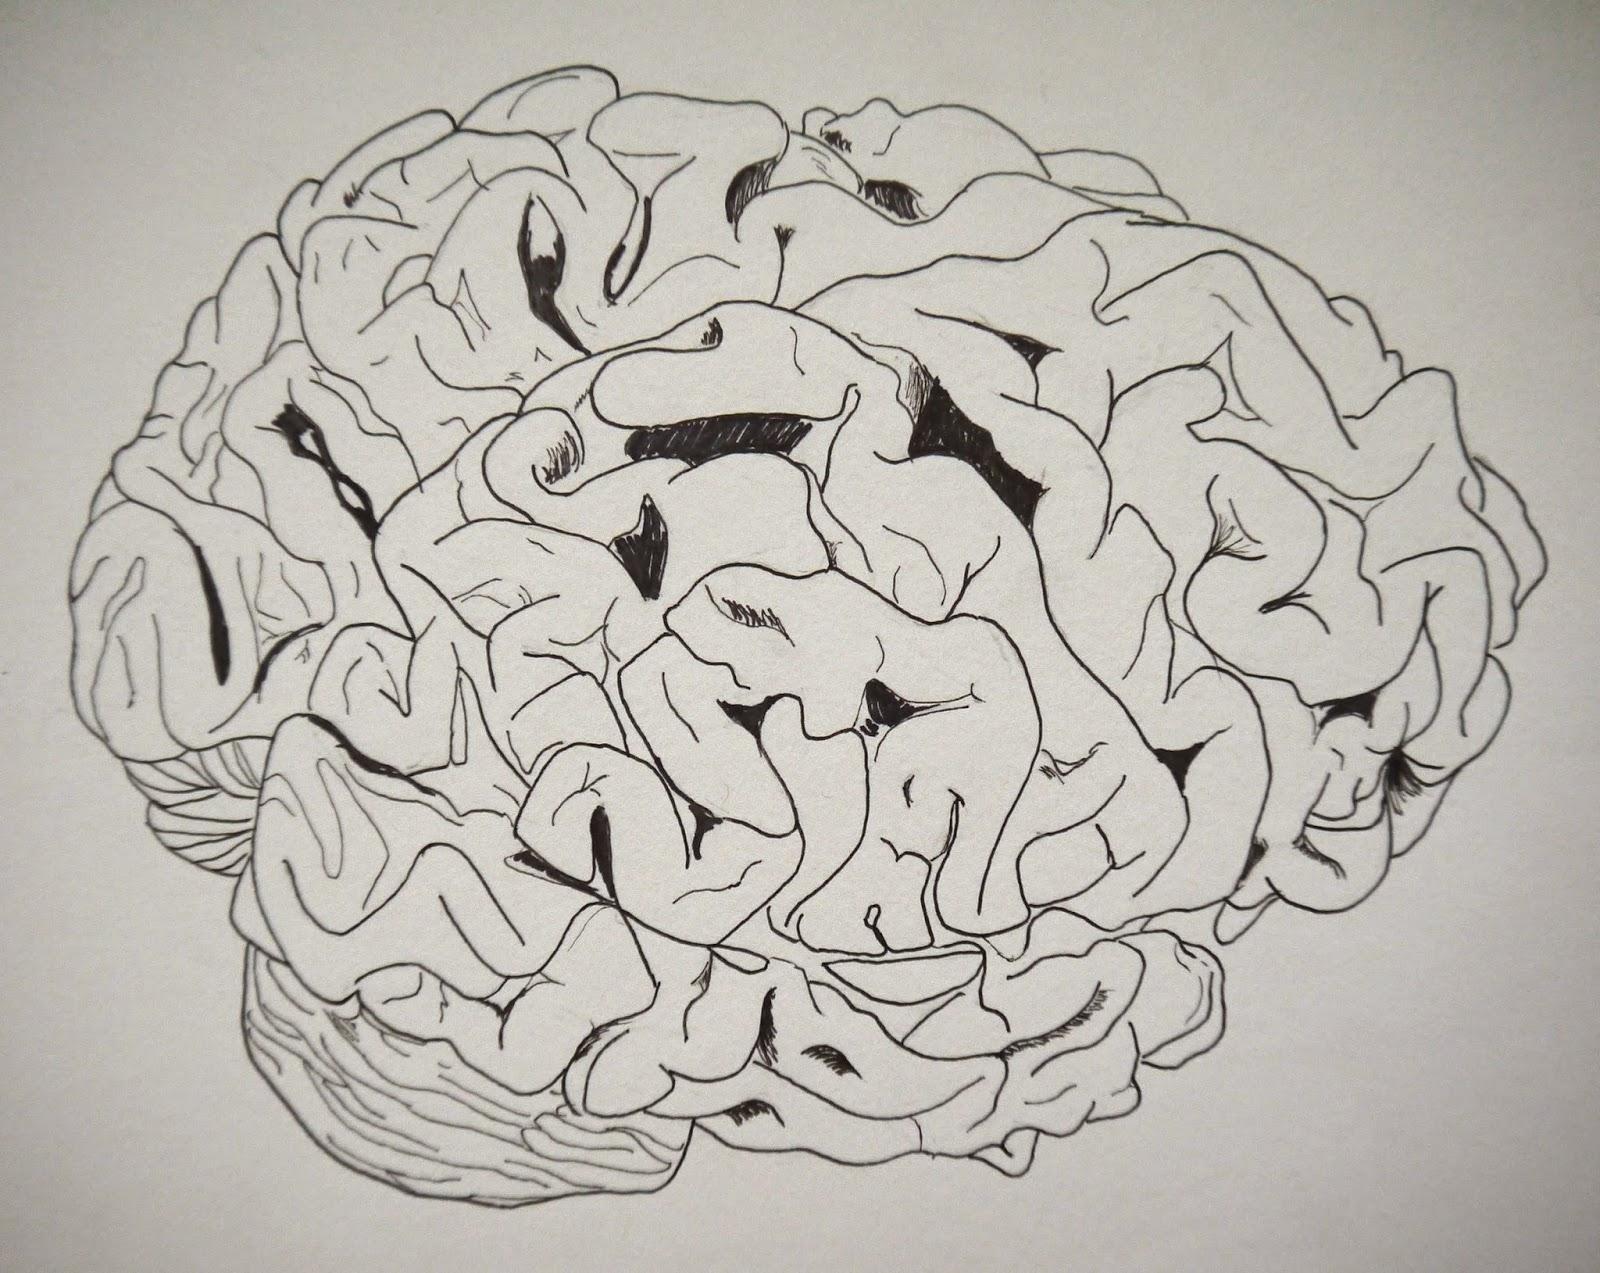 Postcognitive Topics: February 2015